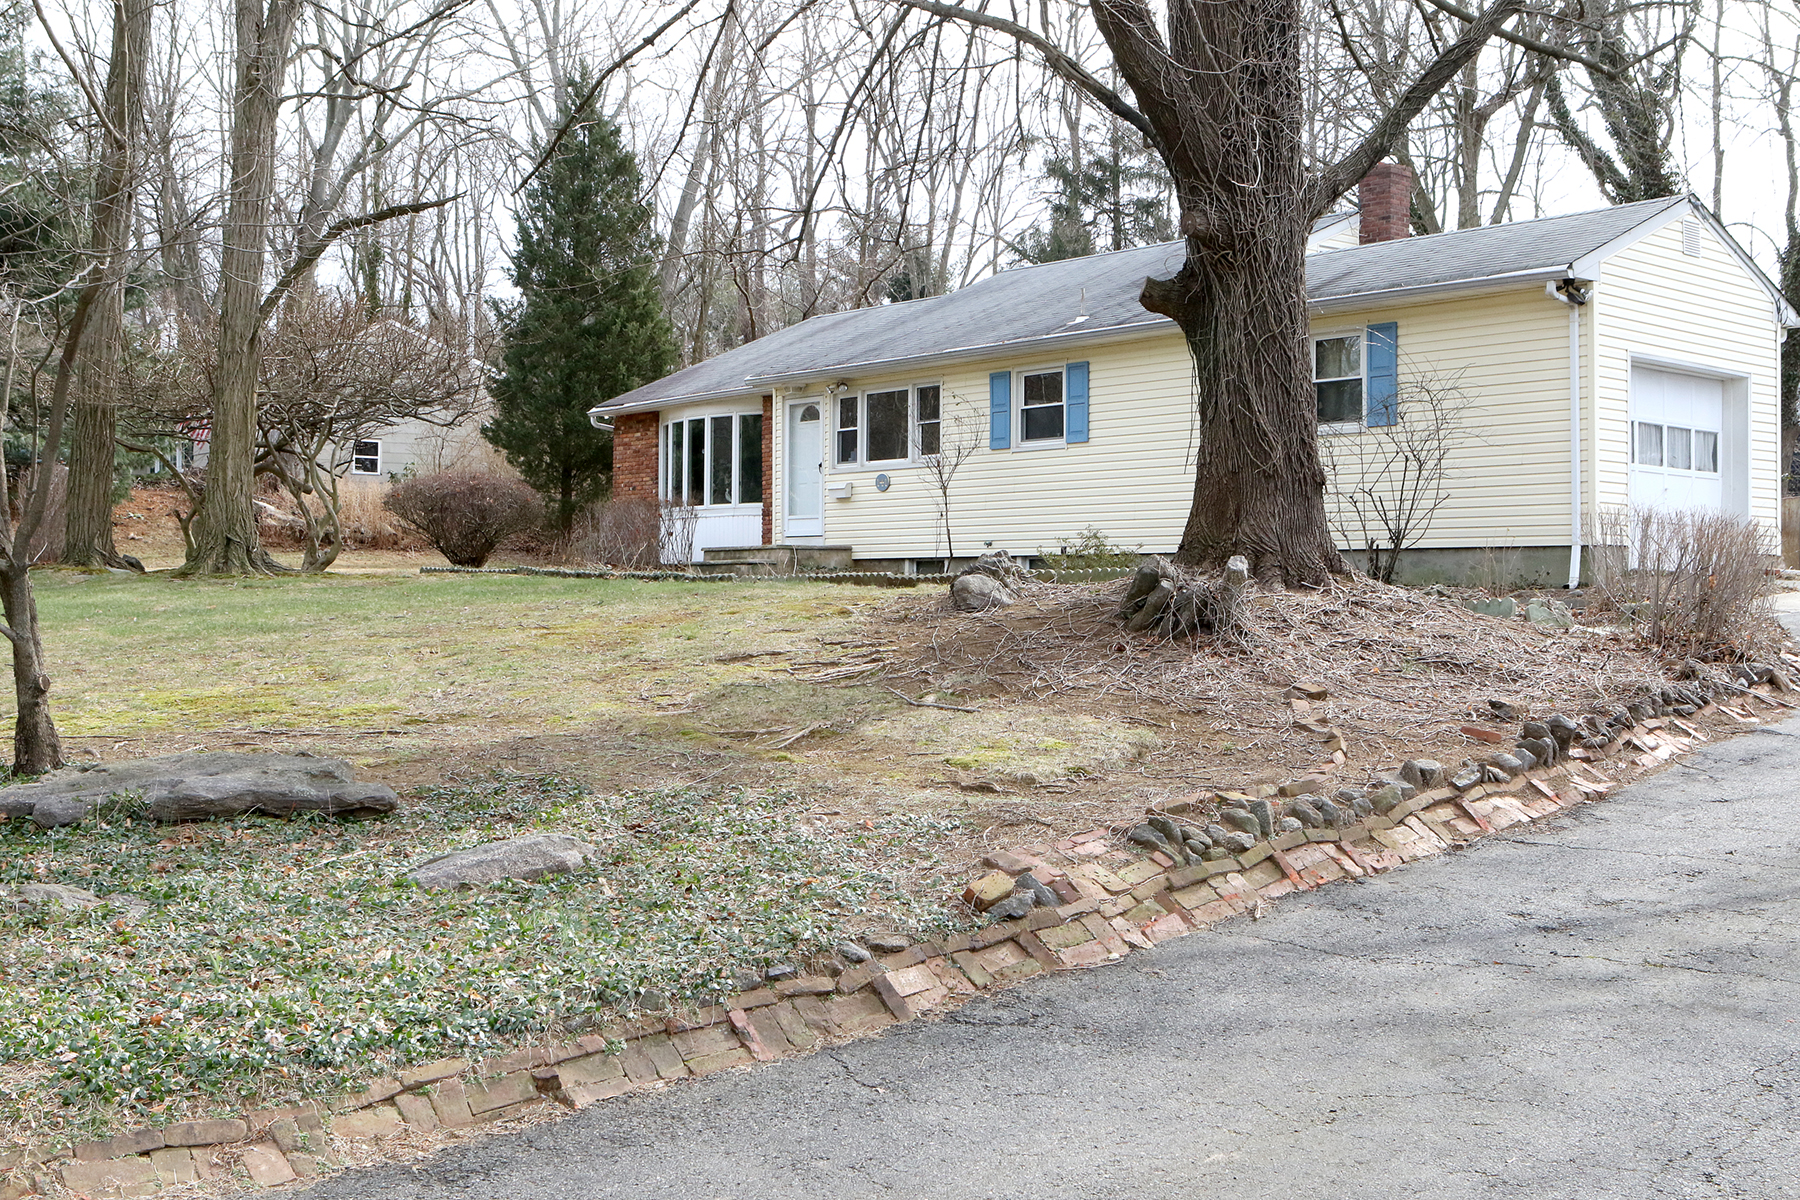 Villa per Vendita alle ore River Plaza Ranch- First Time Offered 141 Bruce Rd Middletown, New Jersey, 07701 Stati Uniti